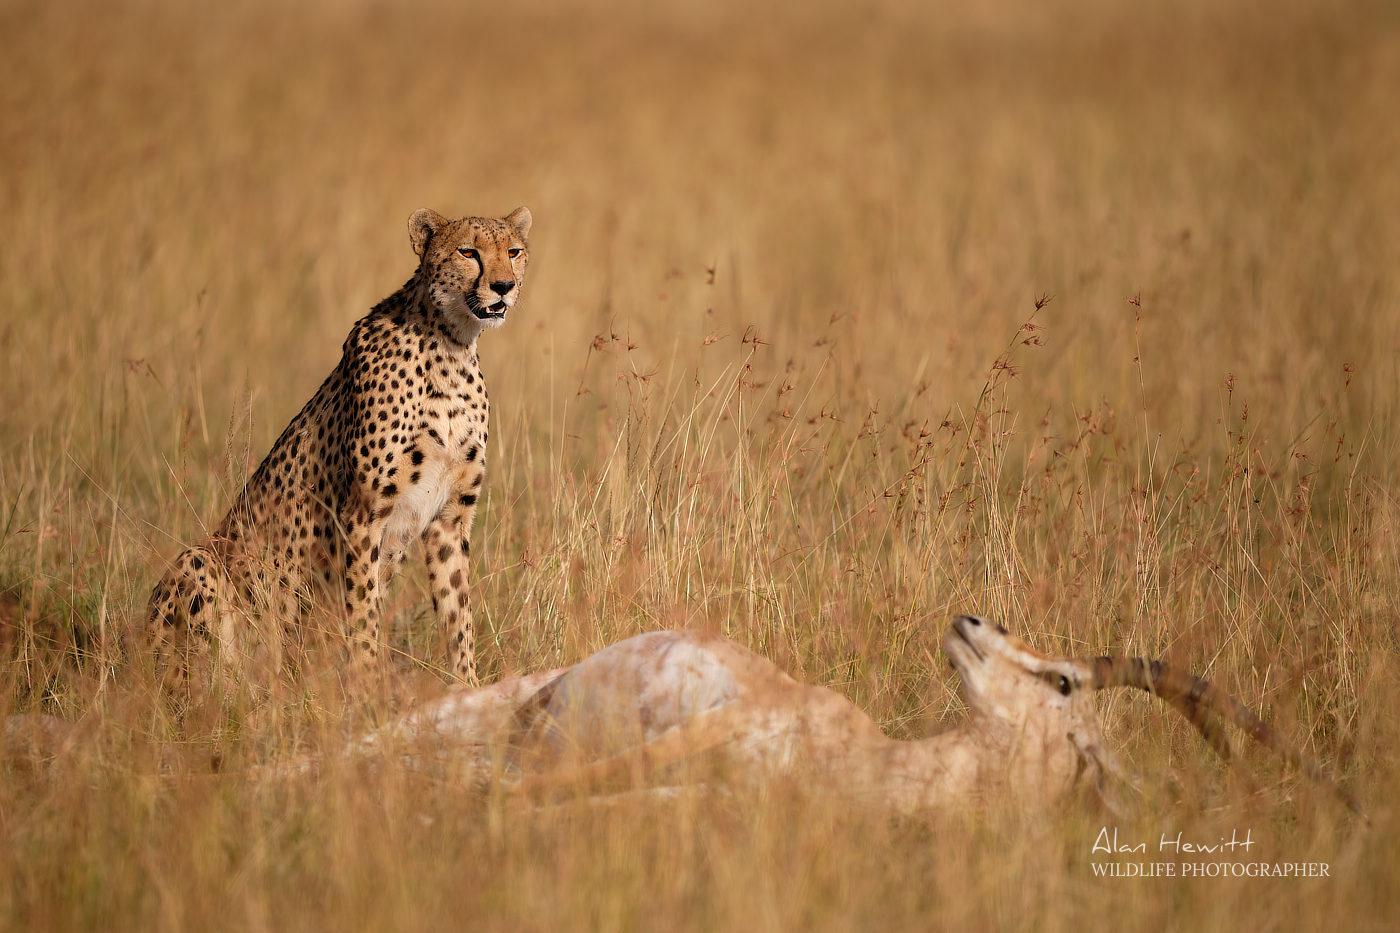 Female Cheetah, 'Kisaru' & Grant's Gazelle prey. Photographed with the Fujifilm X-H1 & Fujinon 200mm.